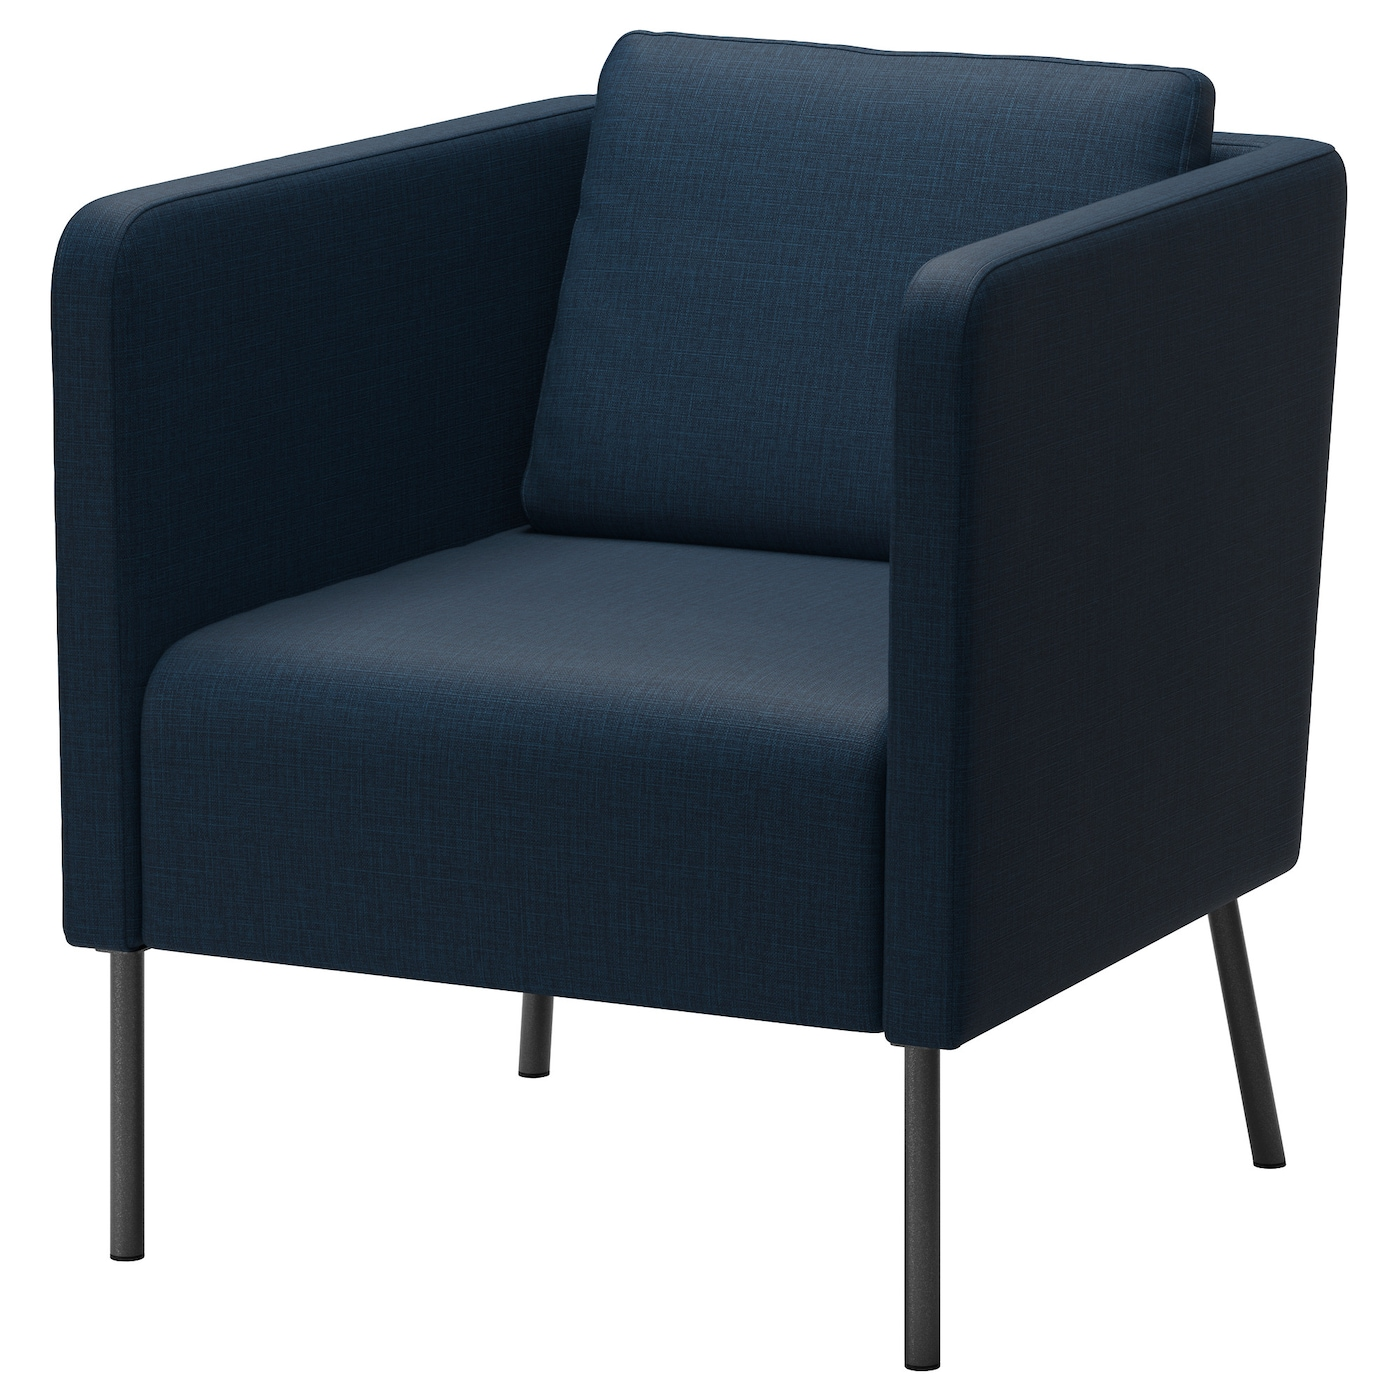 eker fauteuil skiftebo bleu fonc ikea. Black Bedroom Furniture Sets. Home Design Ideas